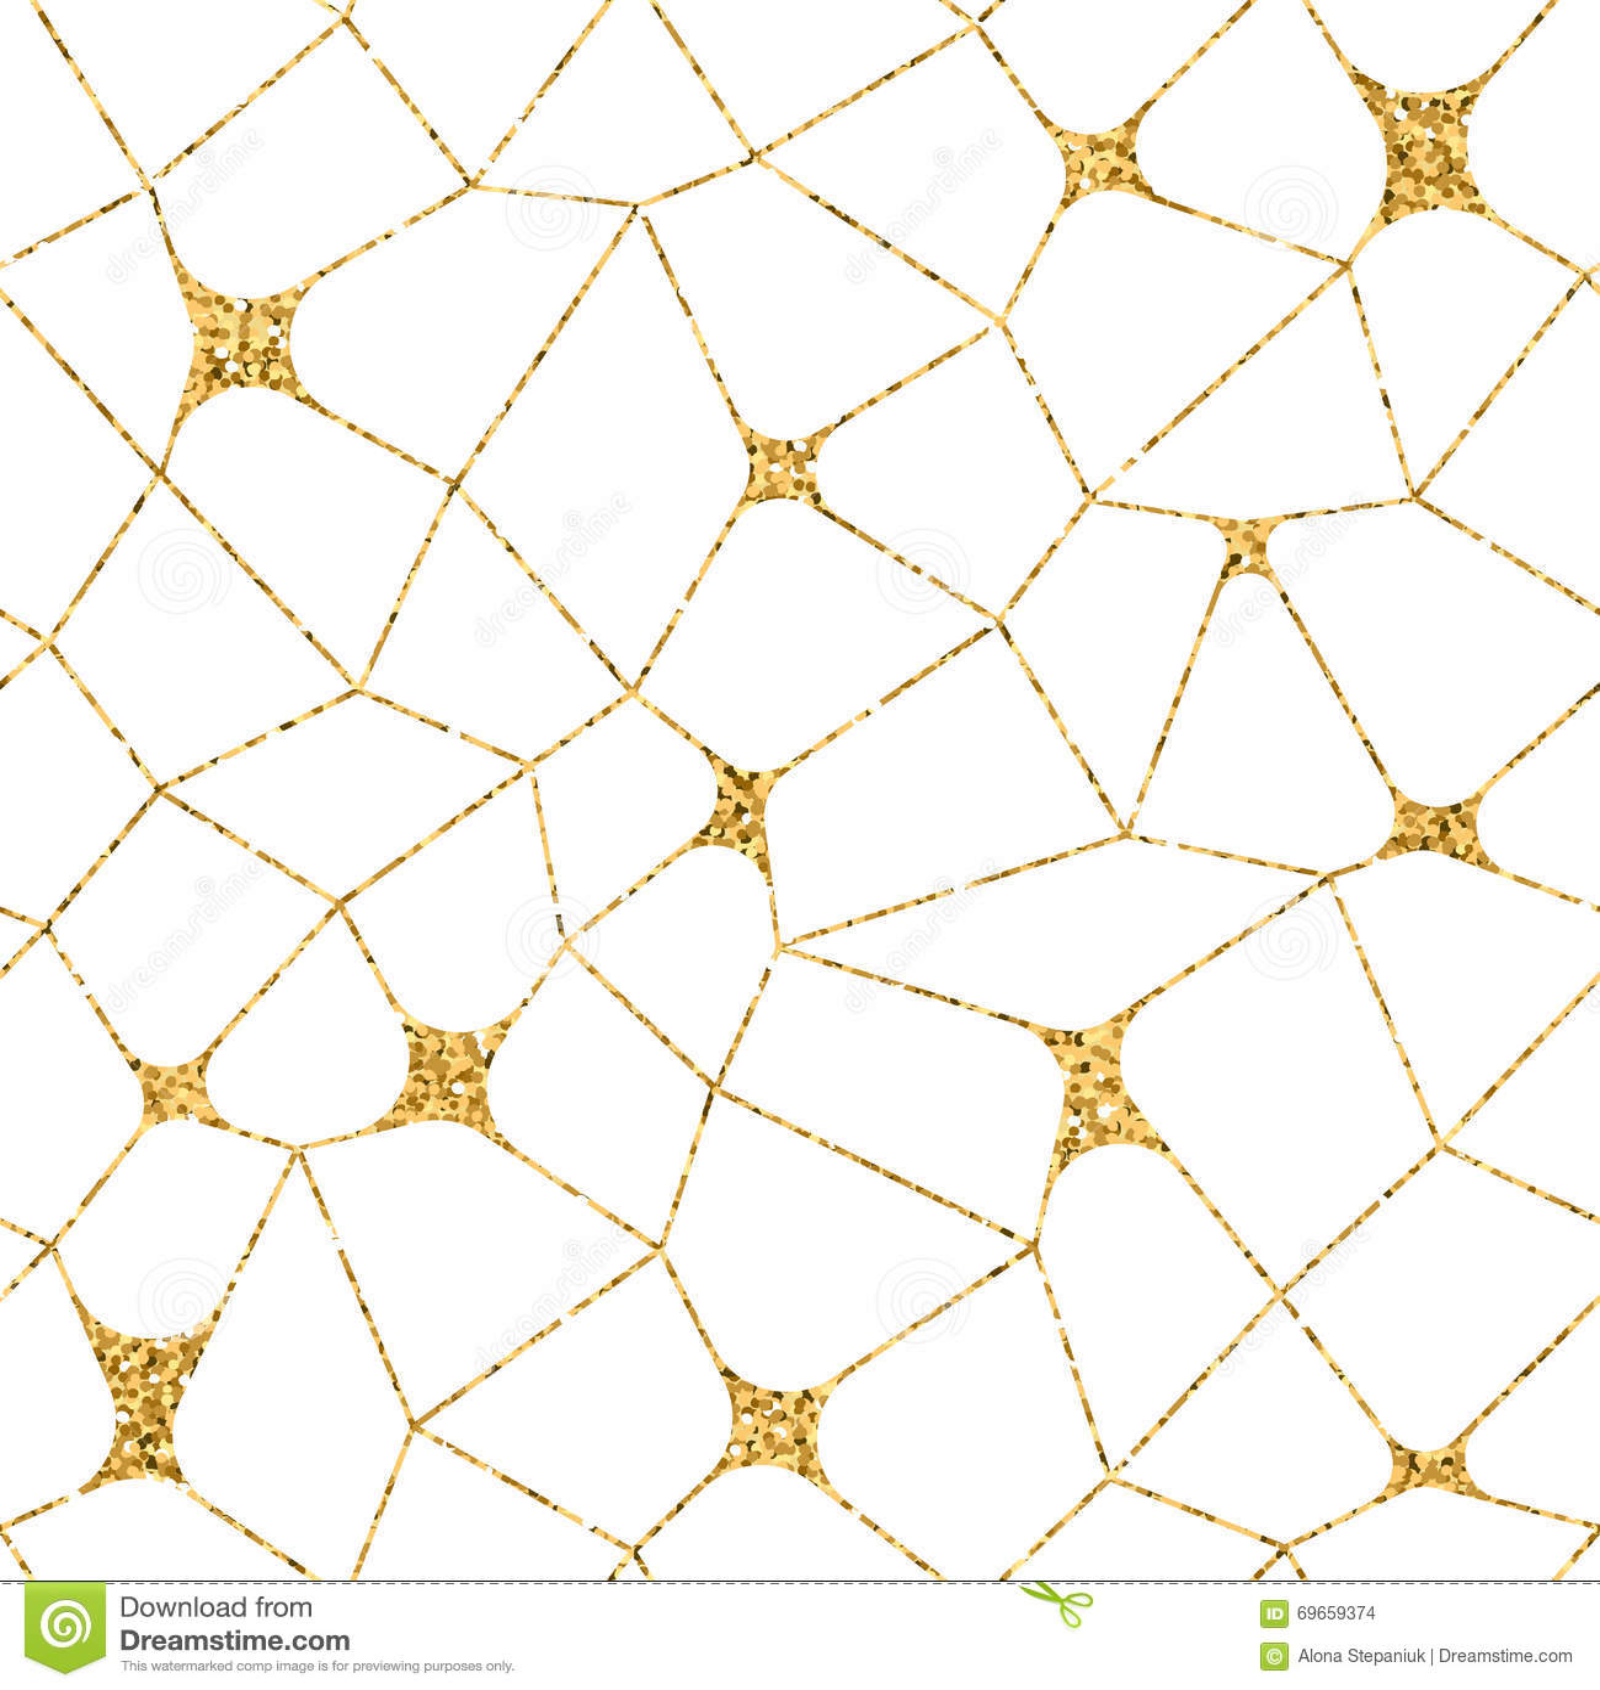 Mosaic Geometric Seamless Pattern 3d Gold White 2 Stock